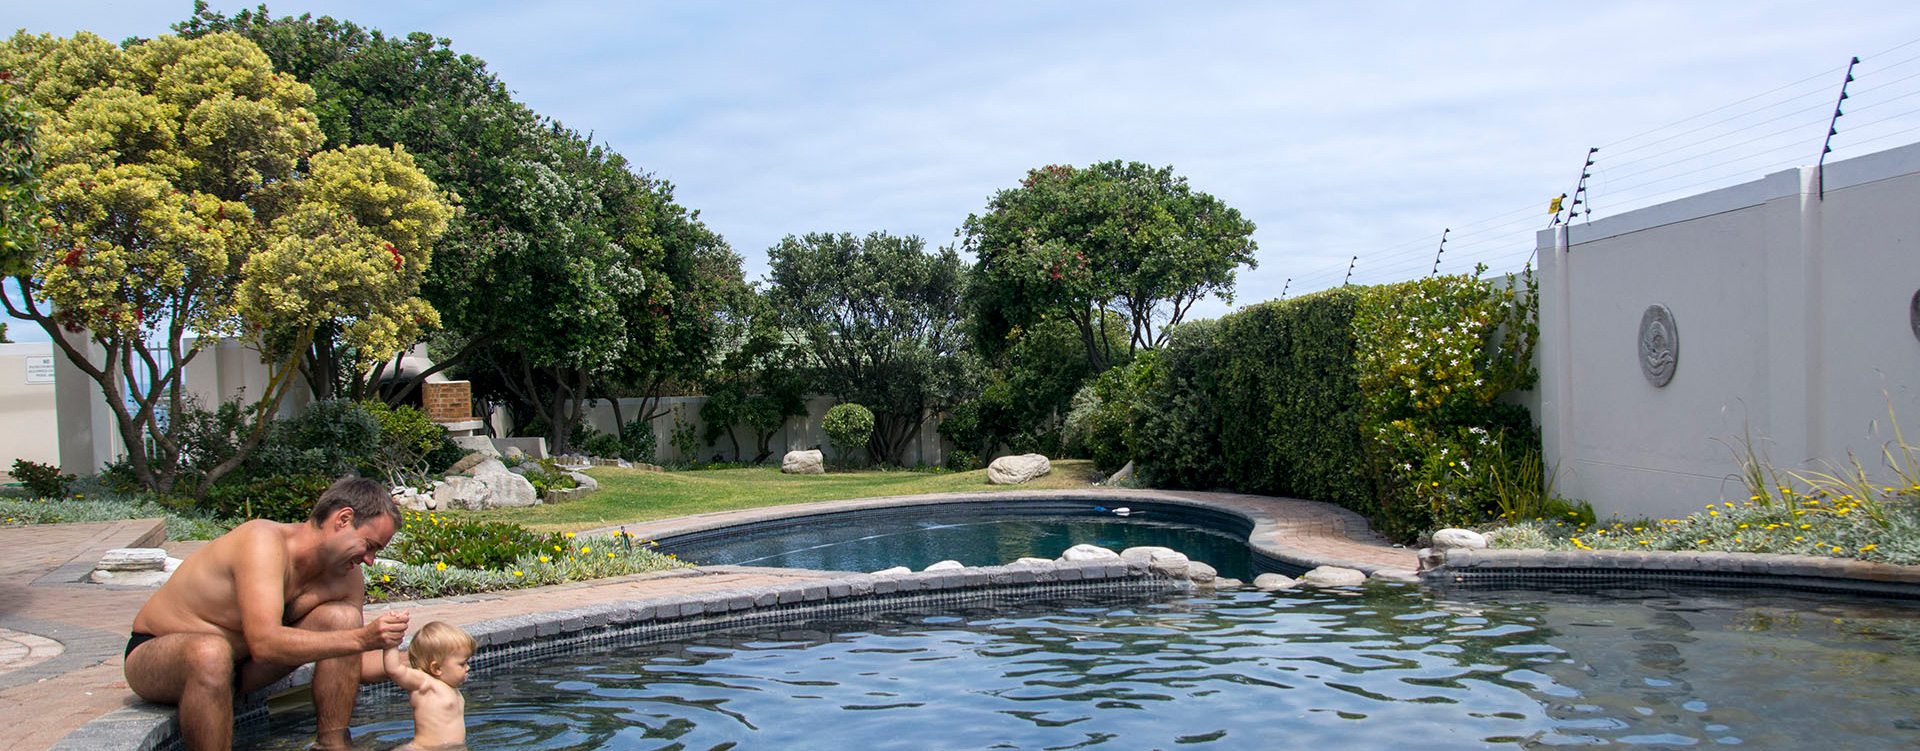 Hotel z basenem w RPA